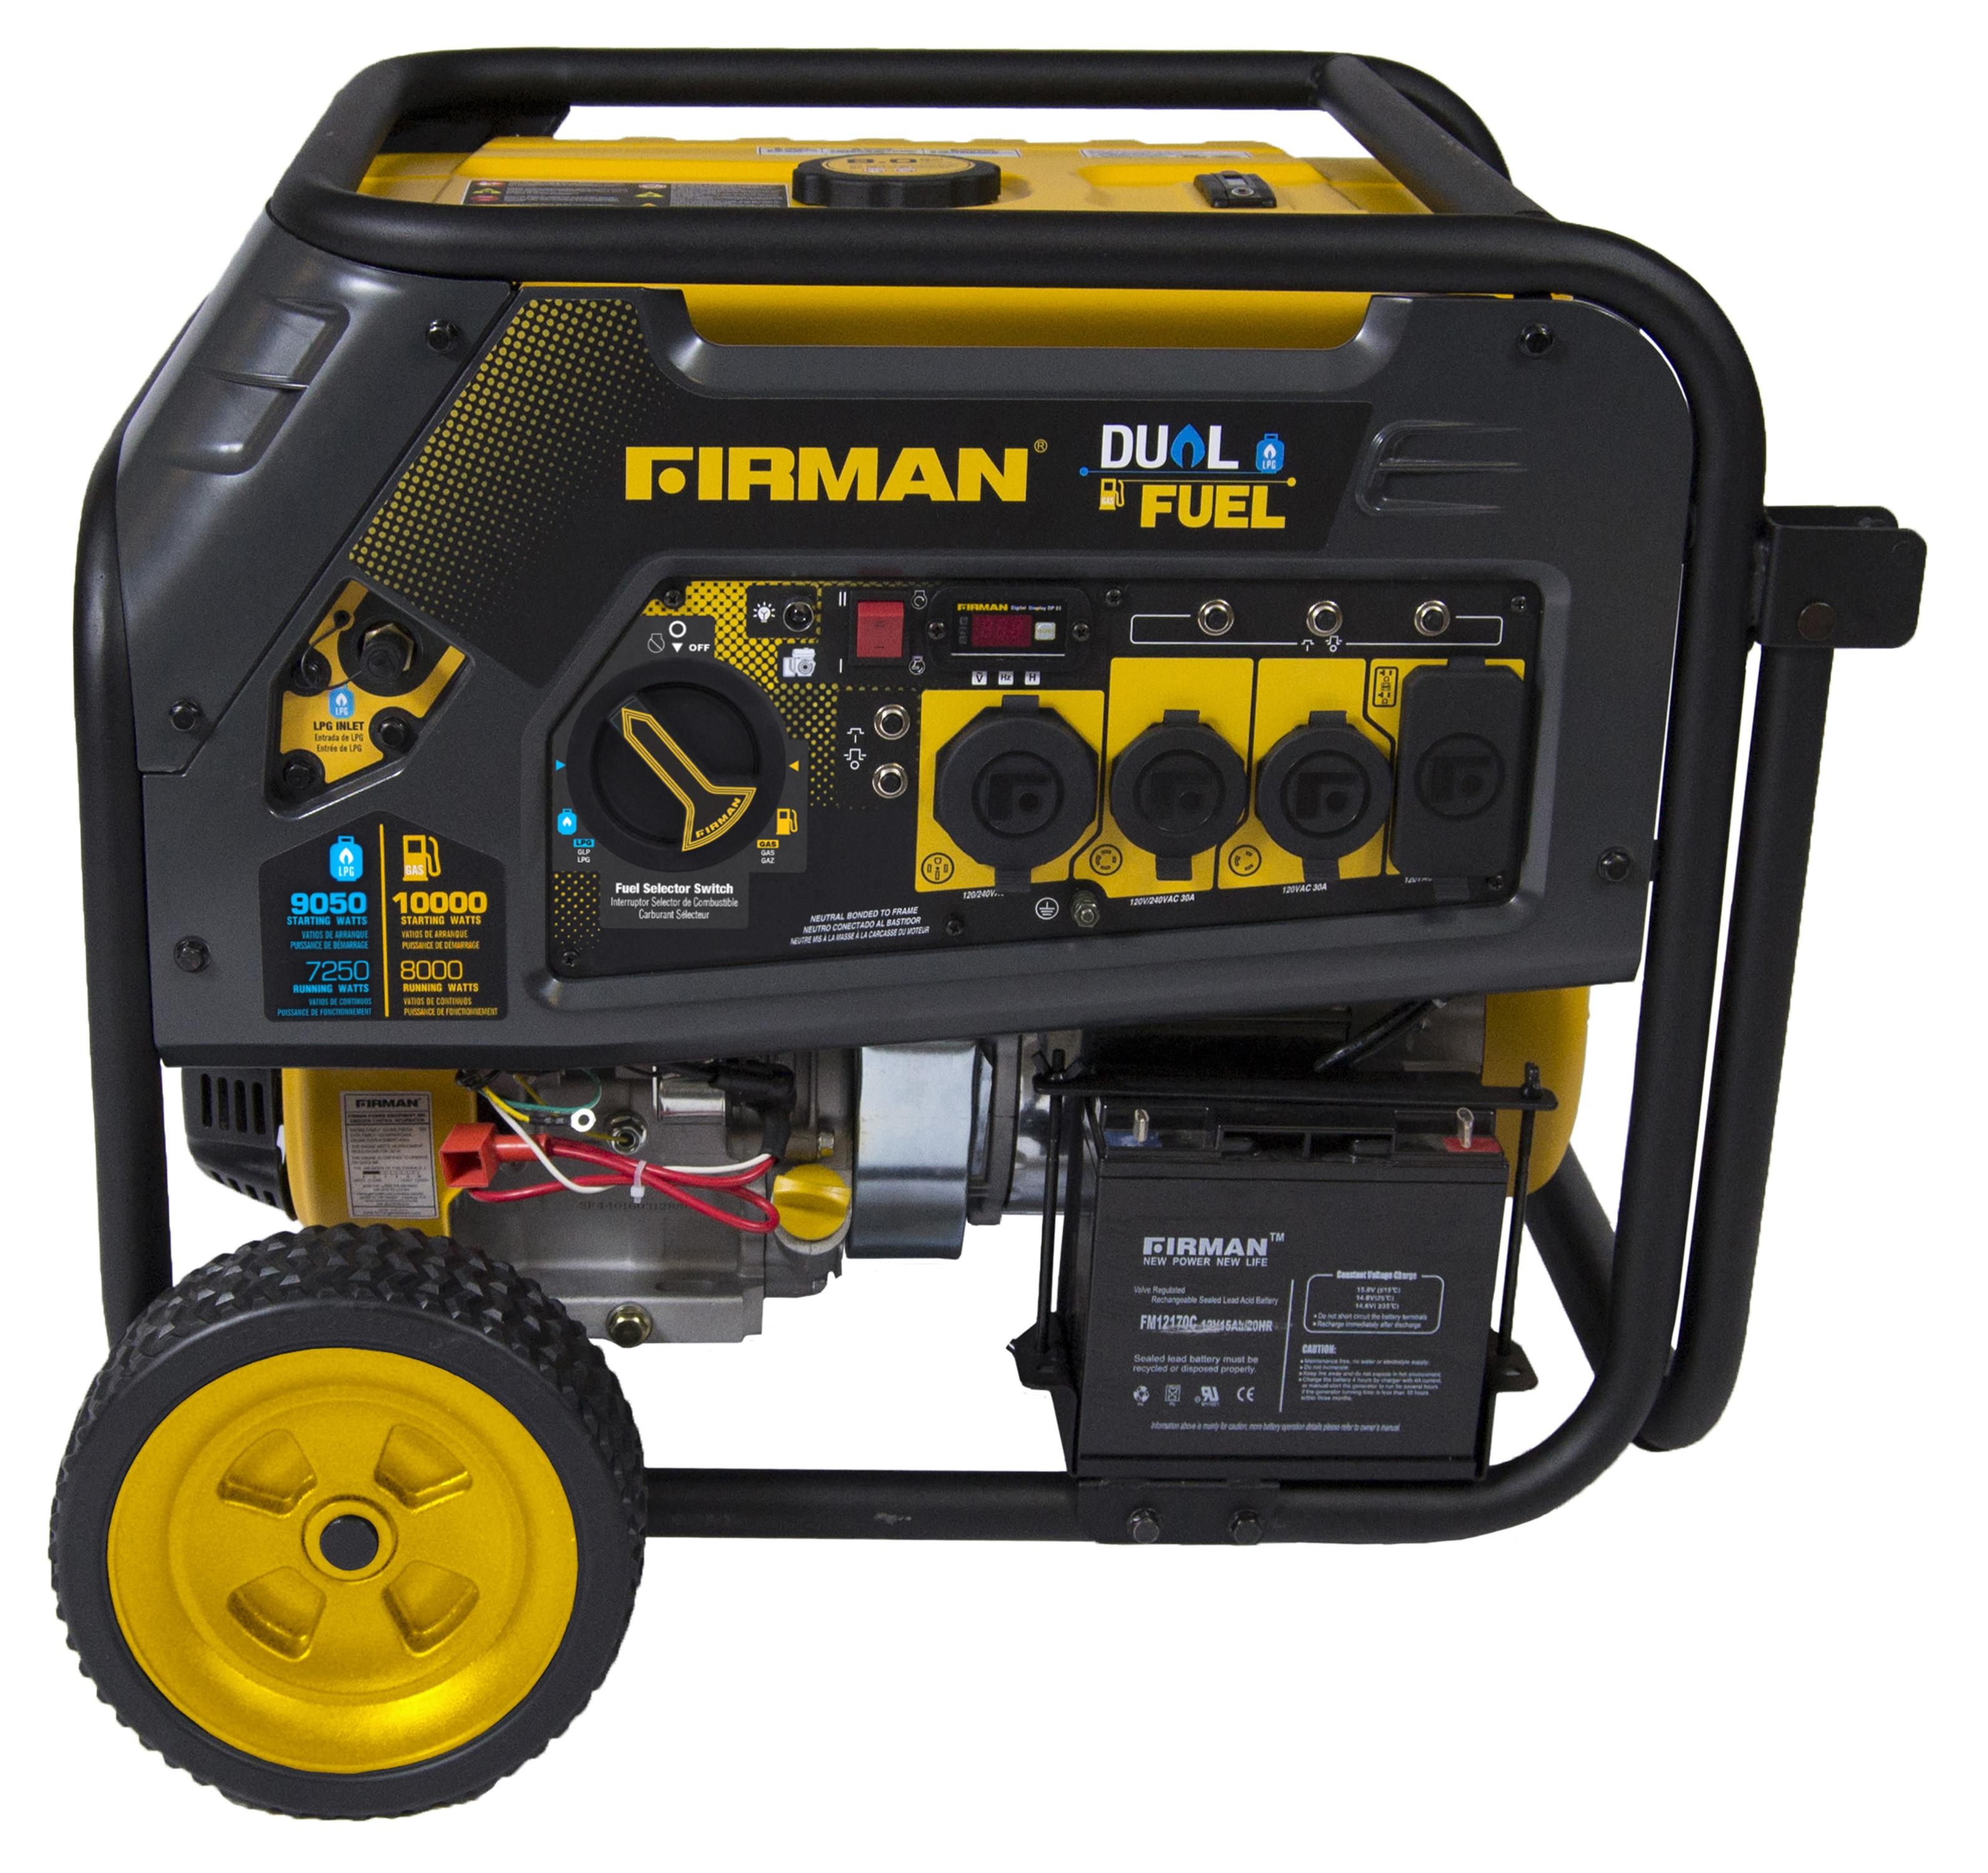 Firman Power Equipment Hybrid Series Dual Fuel Generator 8000